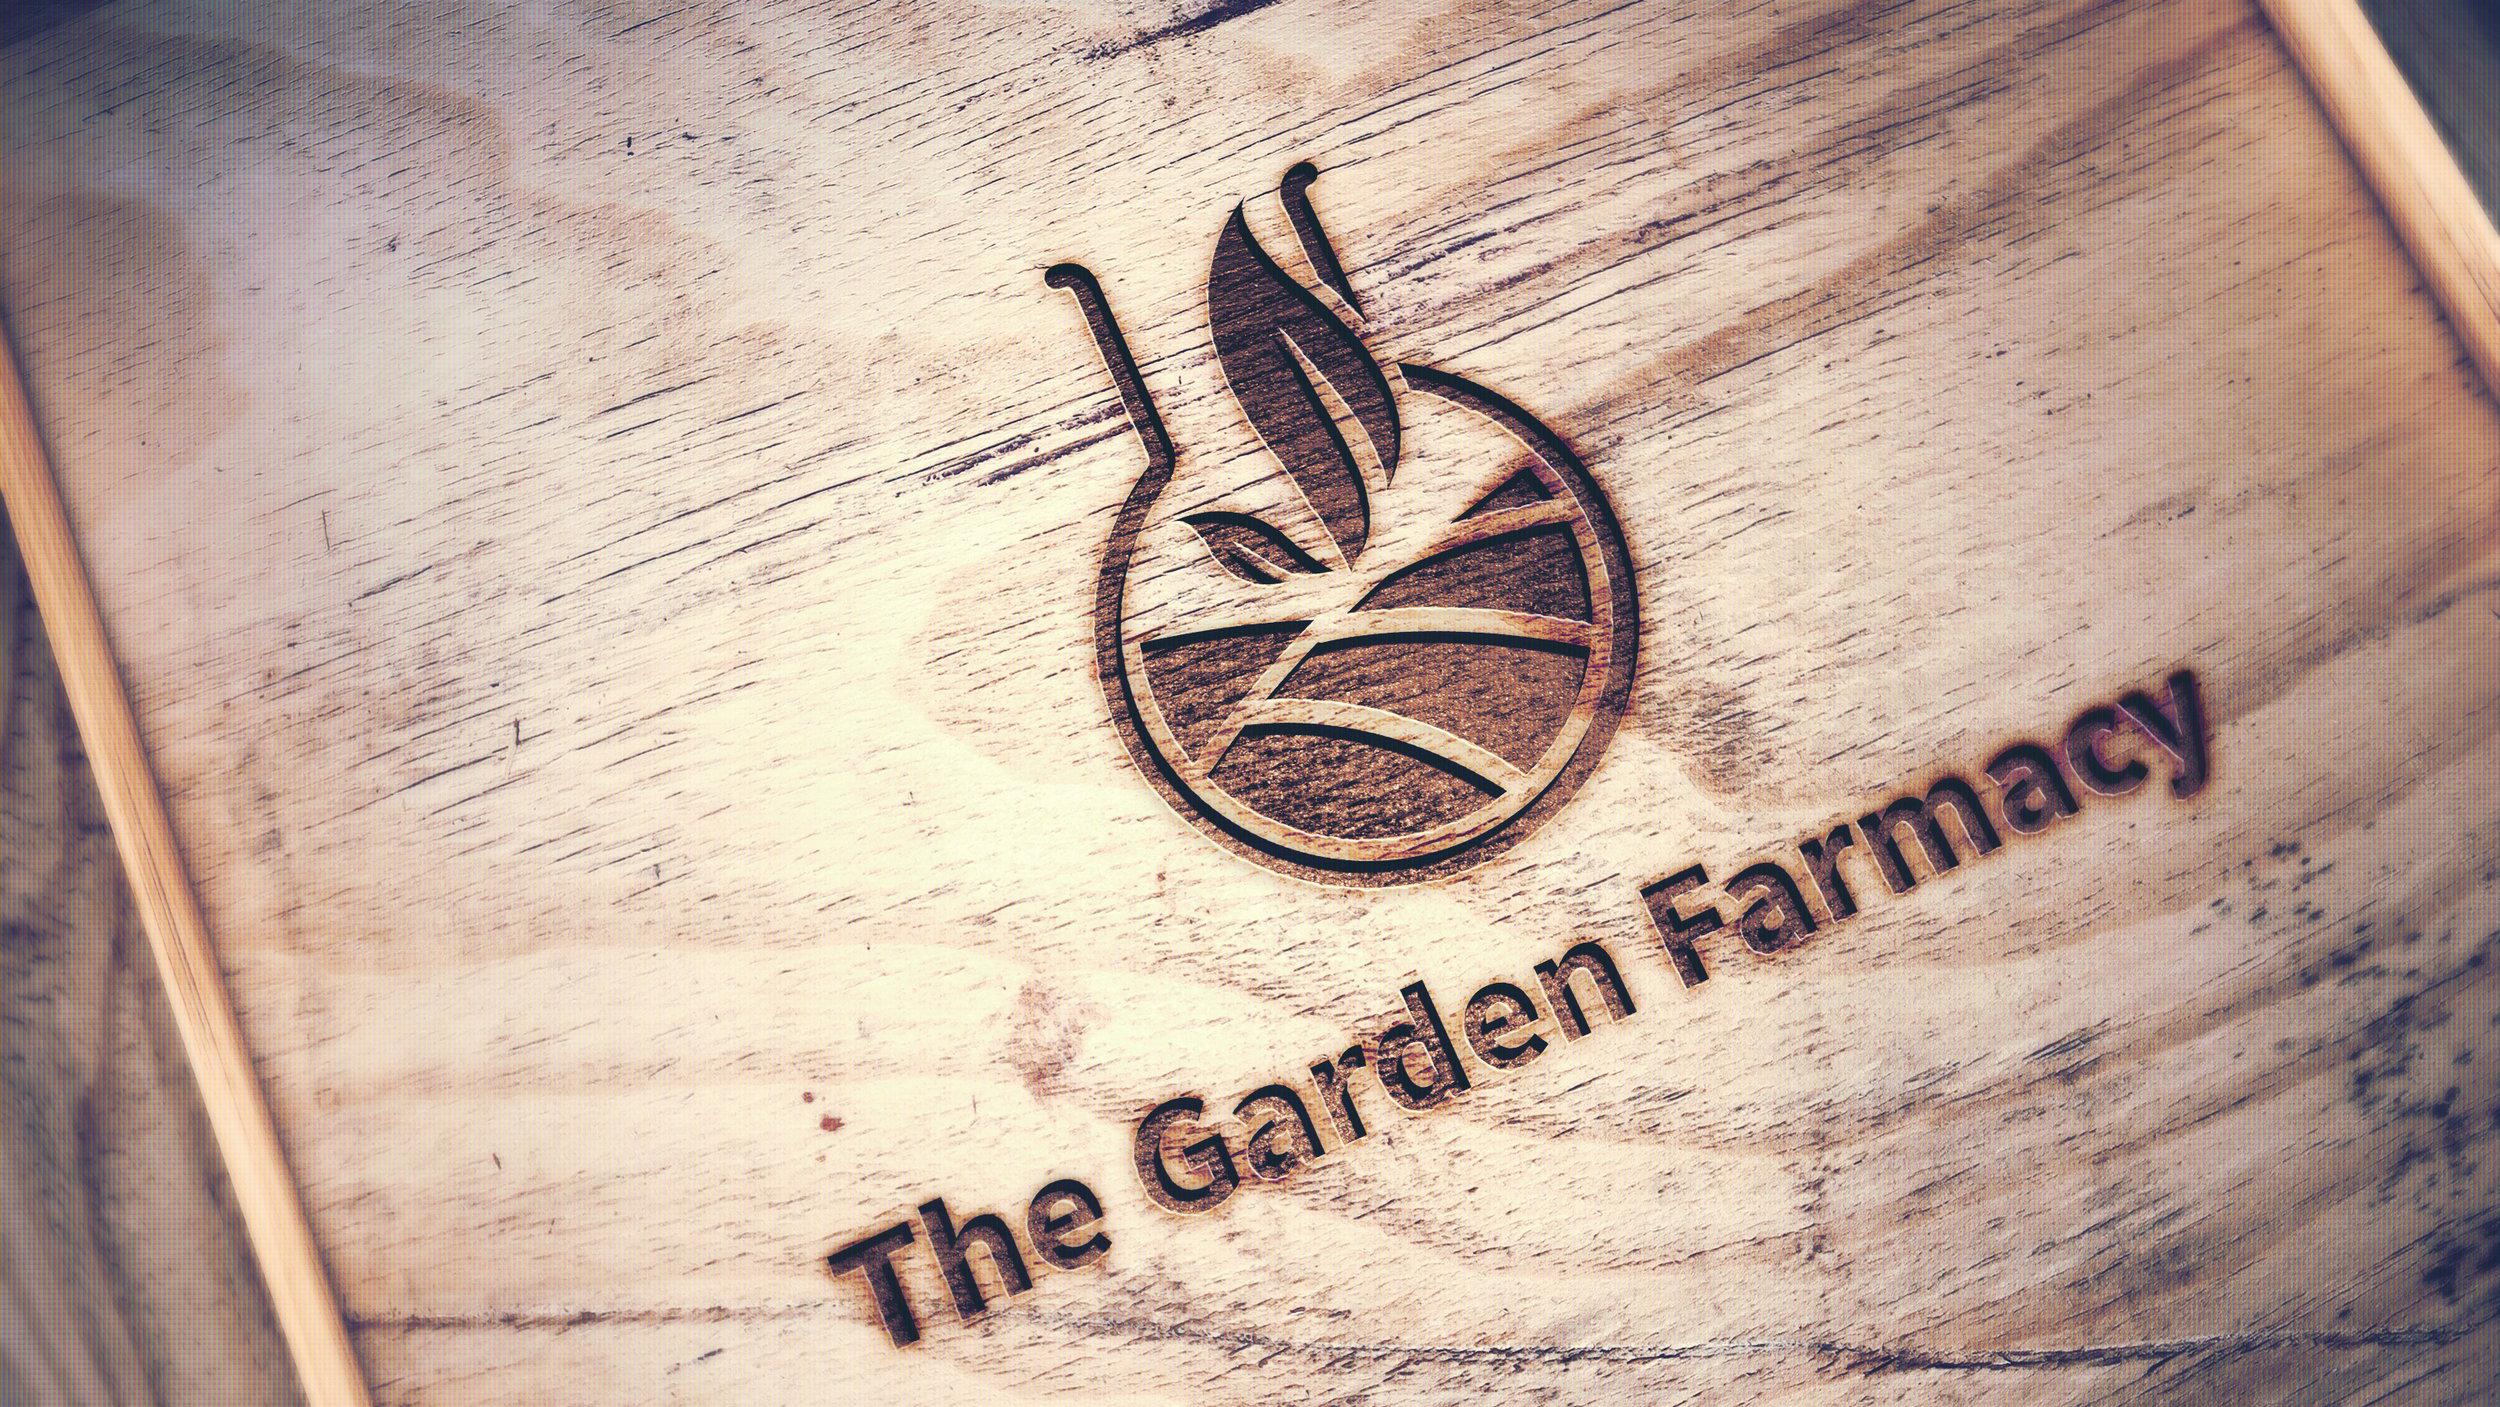 TheGardenFarmacy_Logo_Mockup.jpg